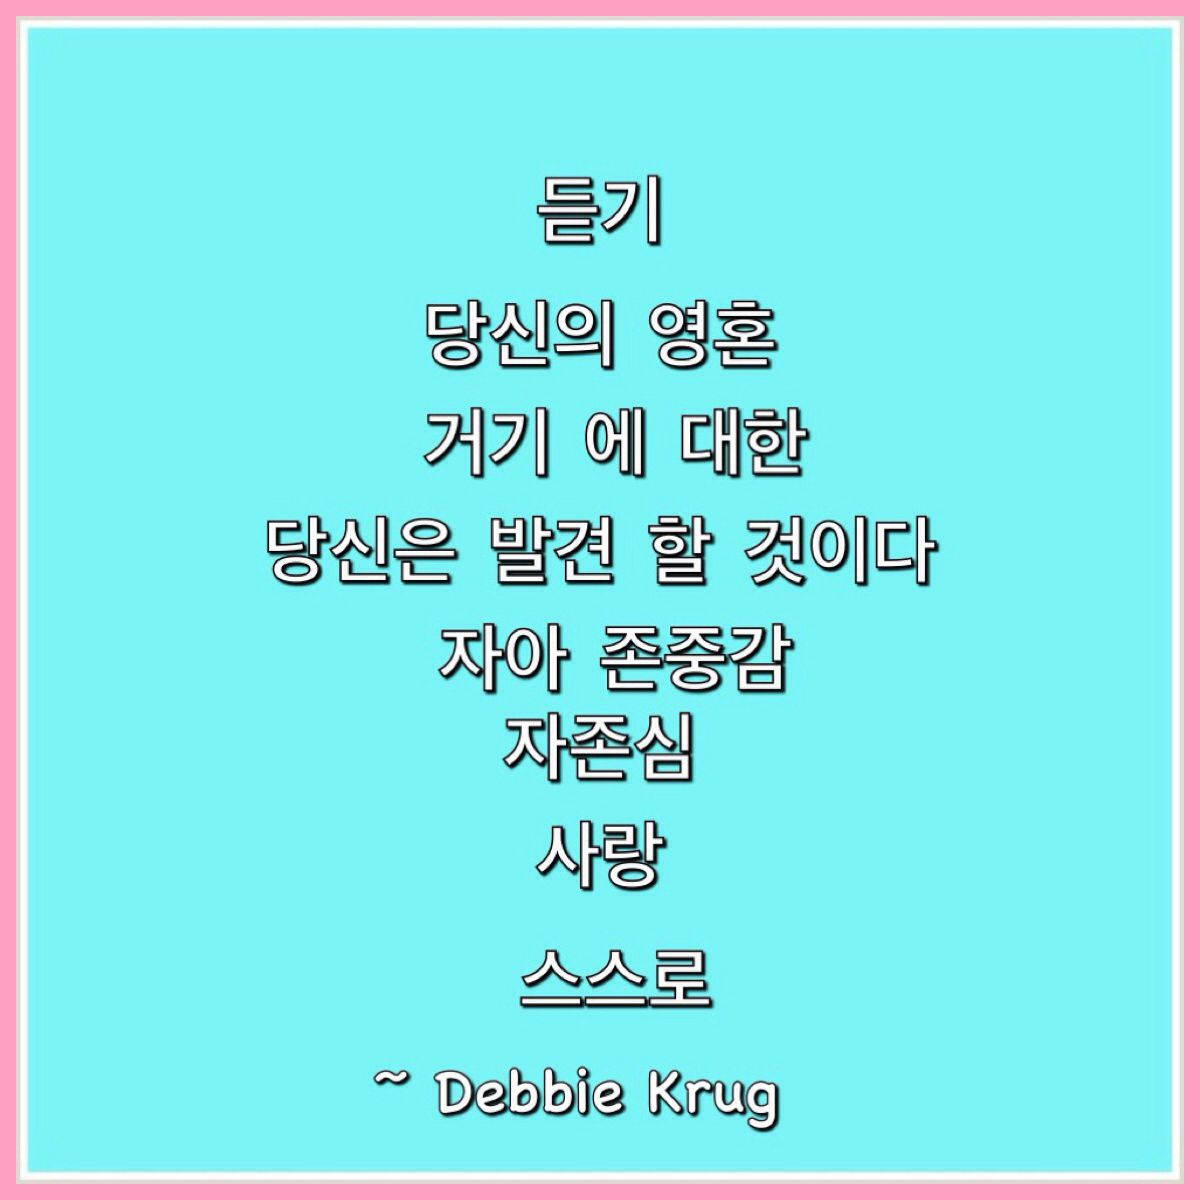 Listen to your soul for there you will find self esteem, self respect, and love for yourself  듣기 당신의 영혼  거기 에 대한 당신은 발견 할 것이다  자아 존중감 자존심 사랑  스스로 #DebbieKrug   www.DebbieKrug.org